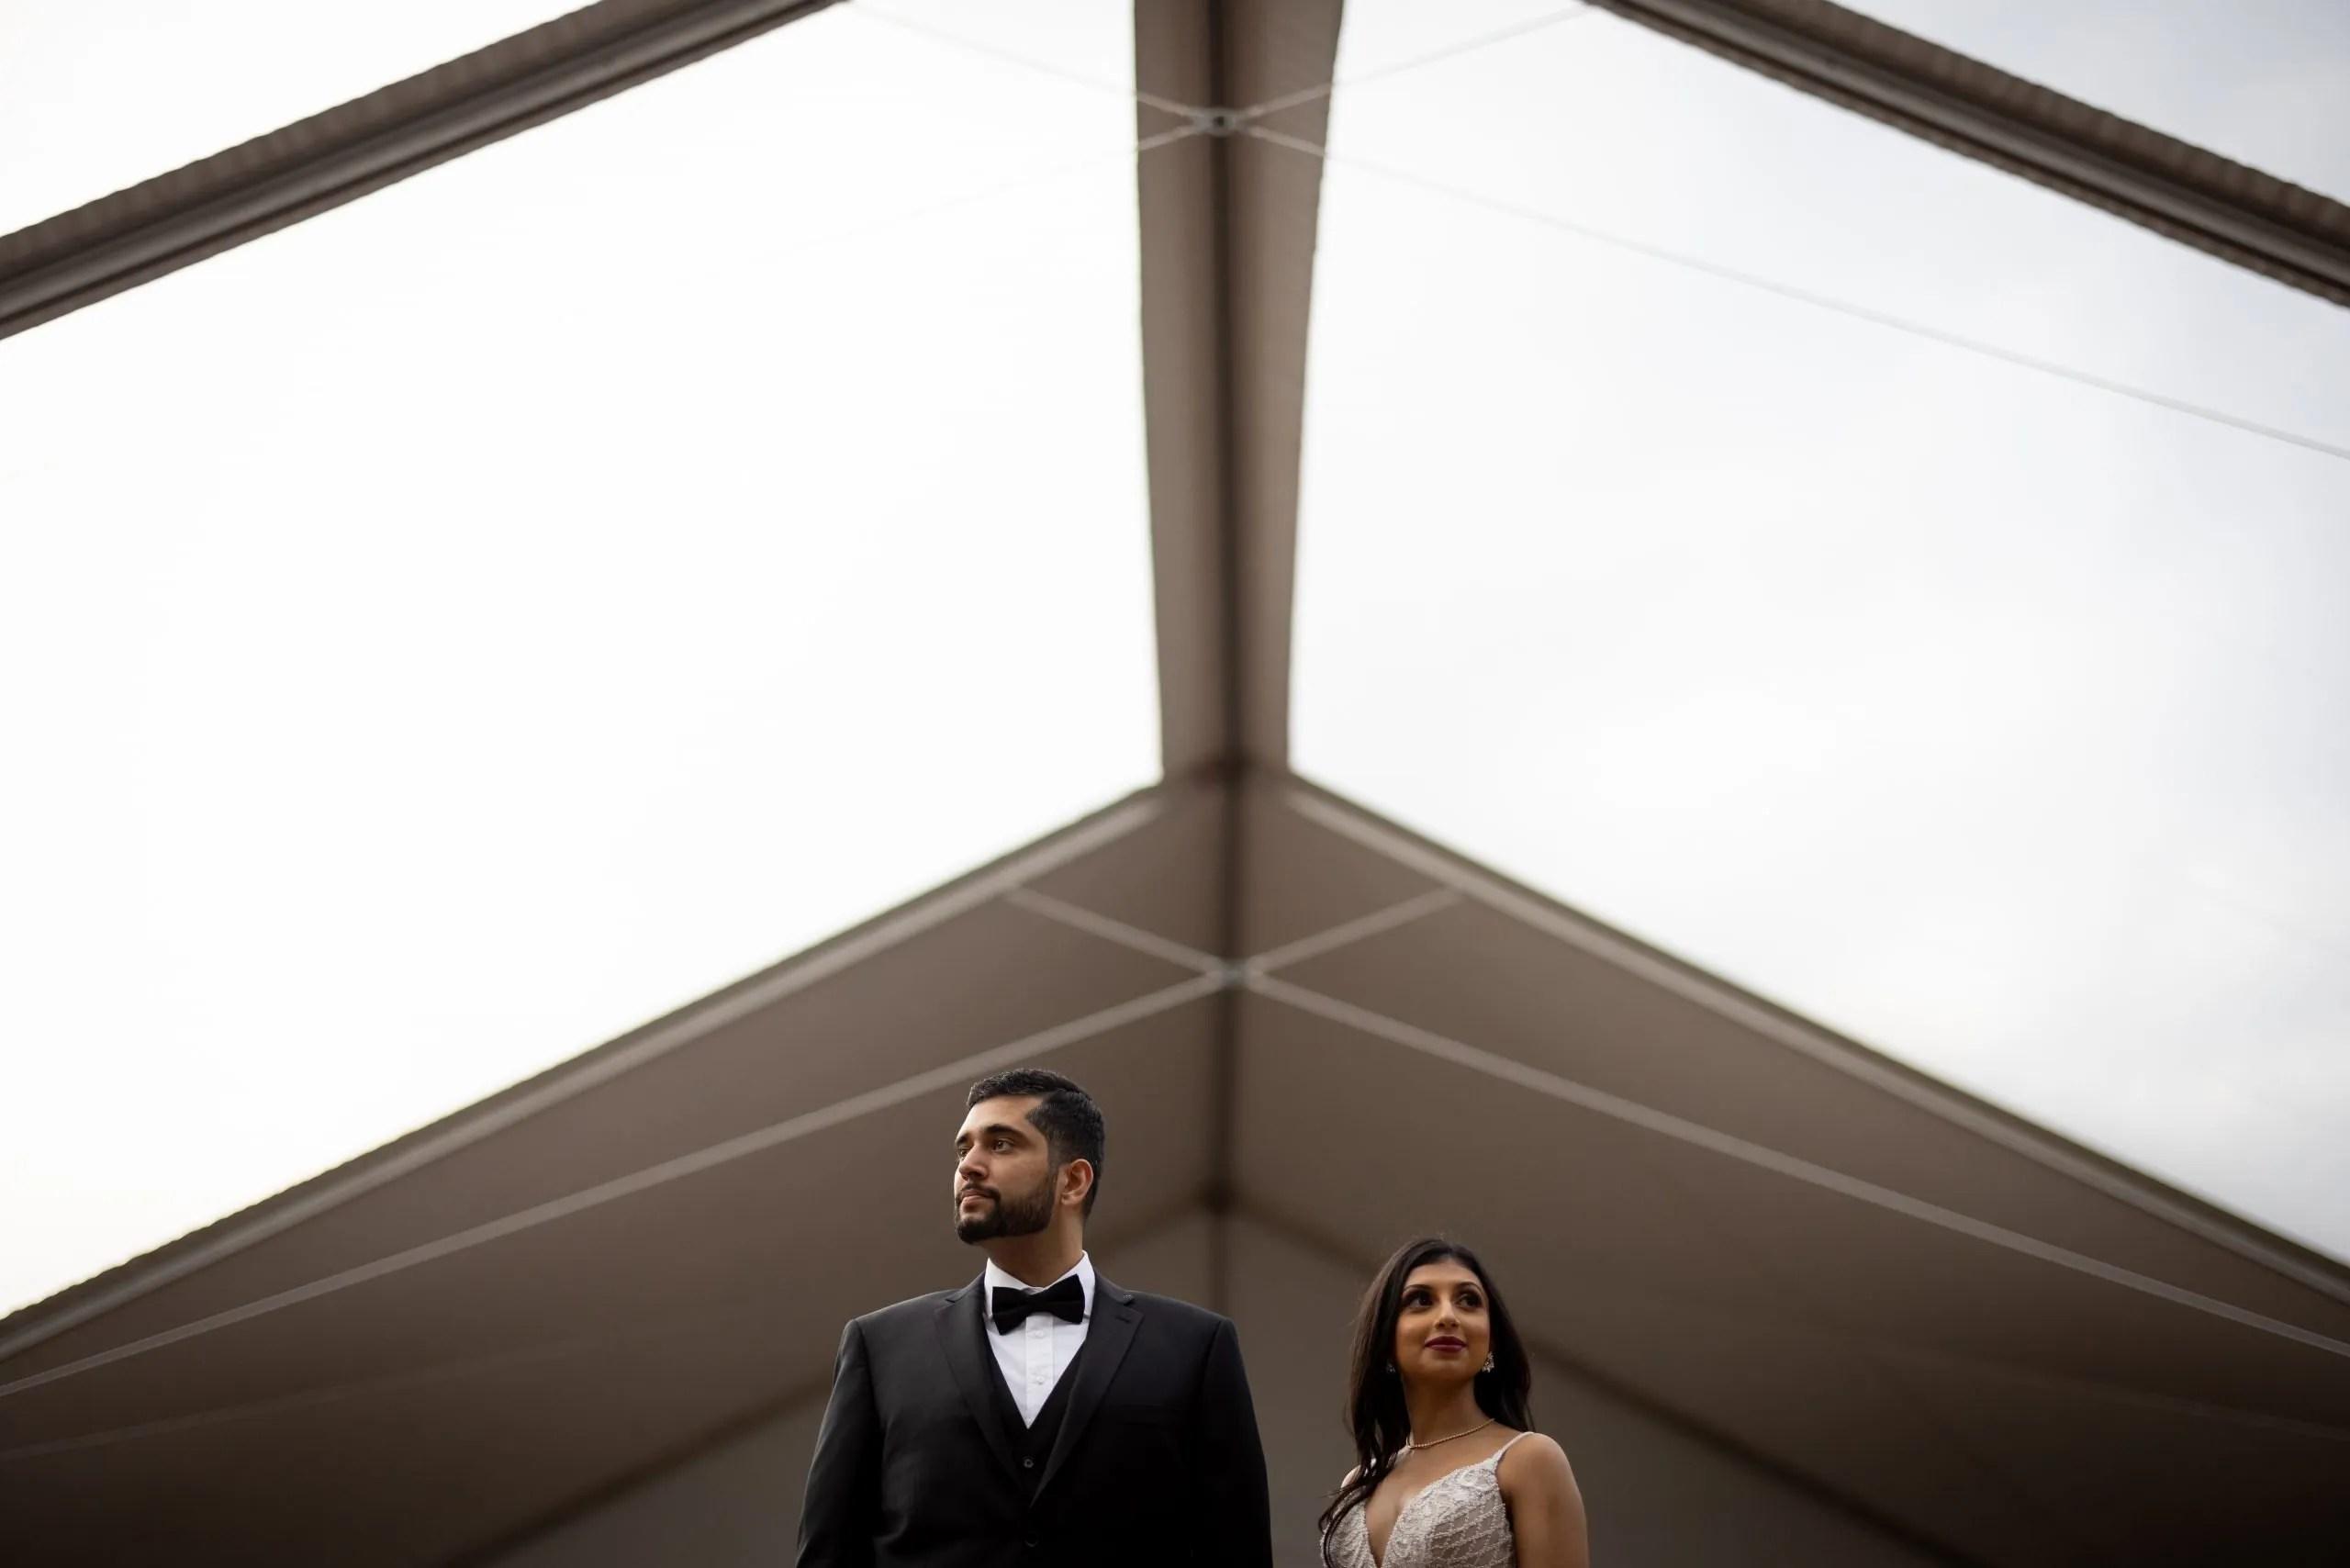 5 - Meghana and Nikhil Wedding - Akbar Sayed Photography